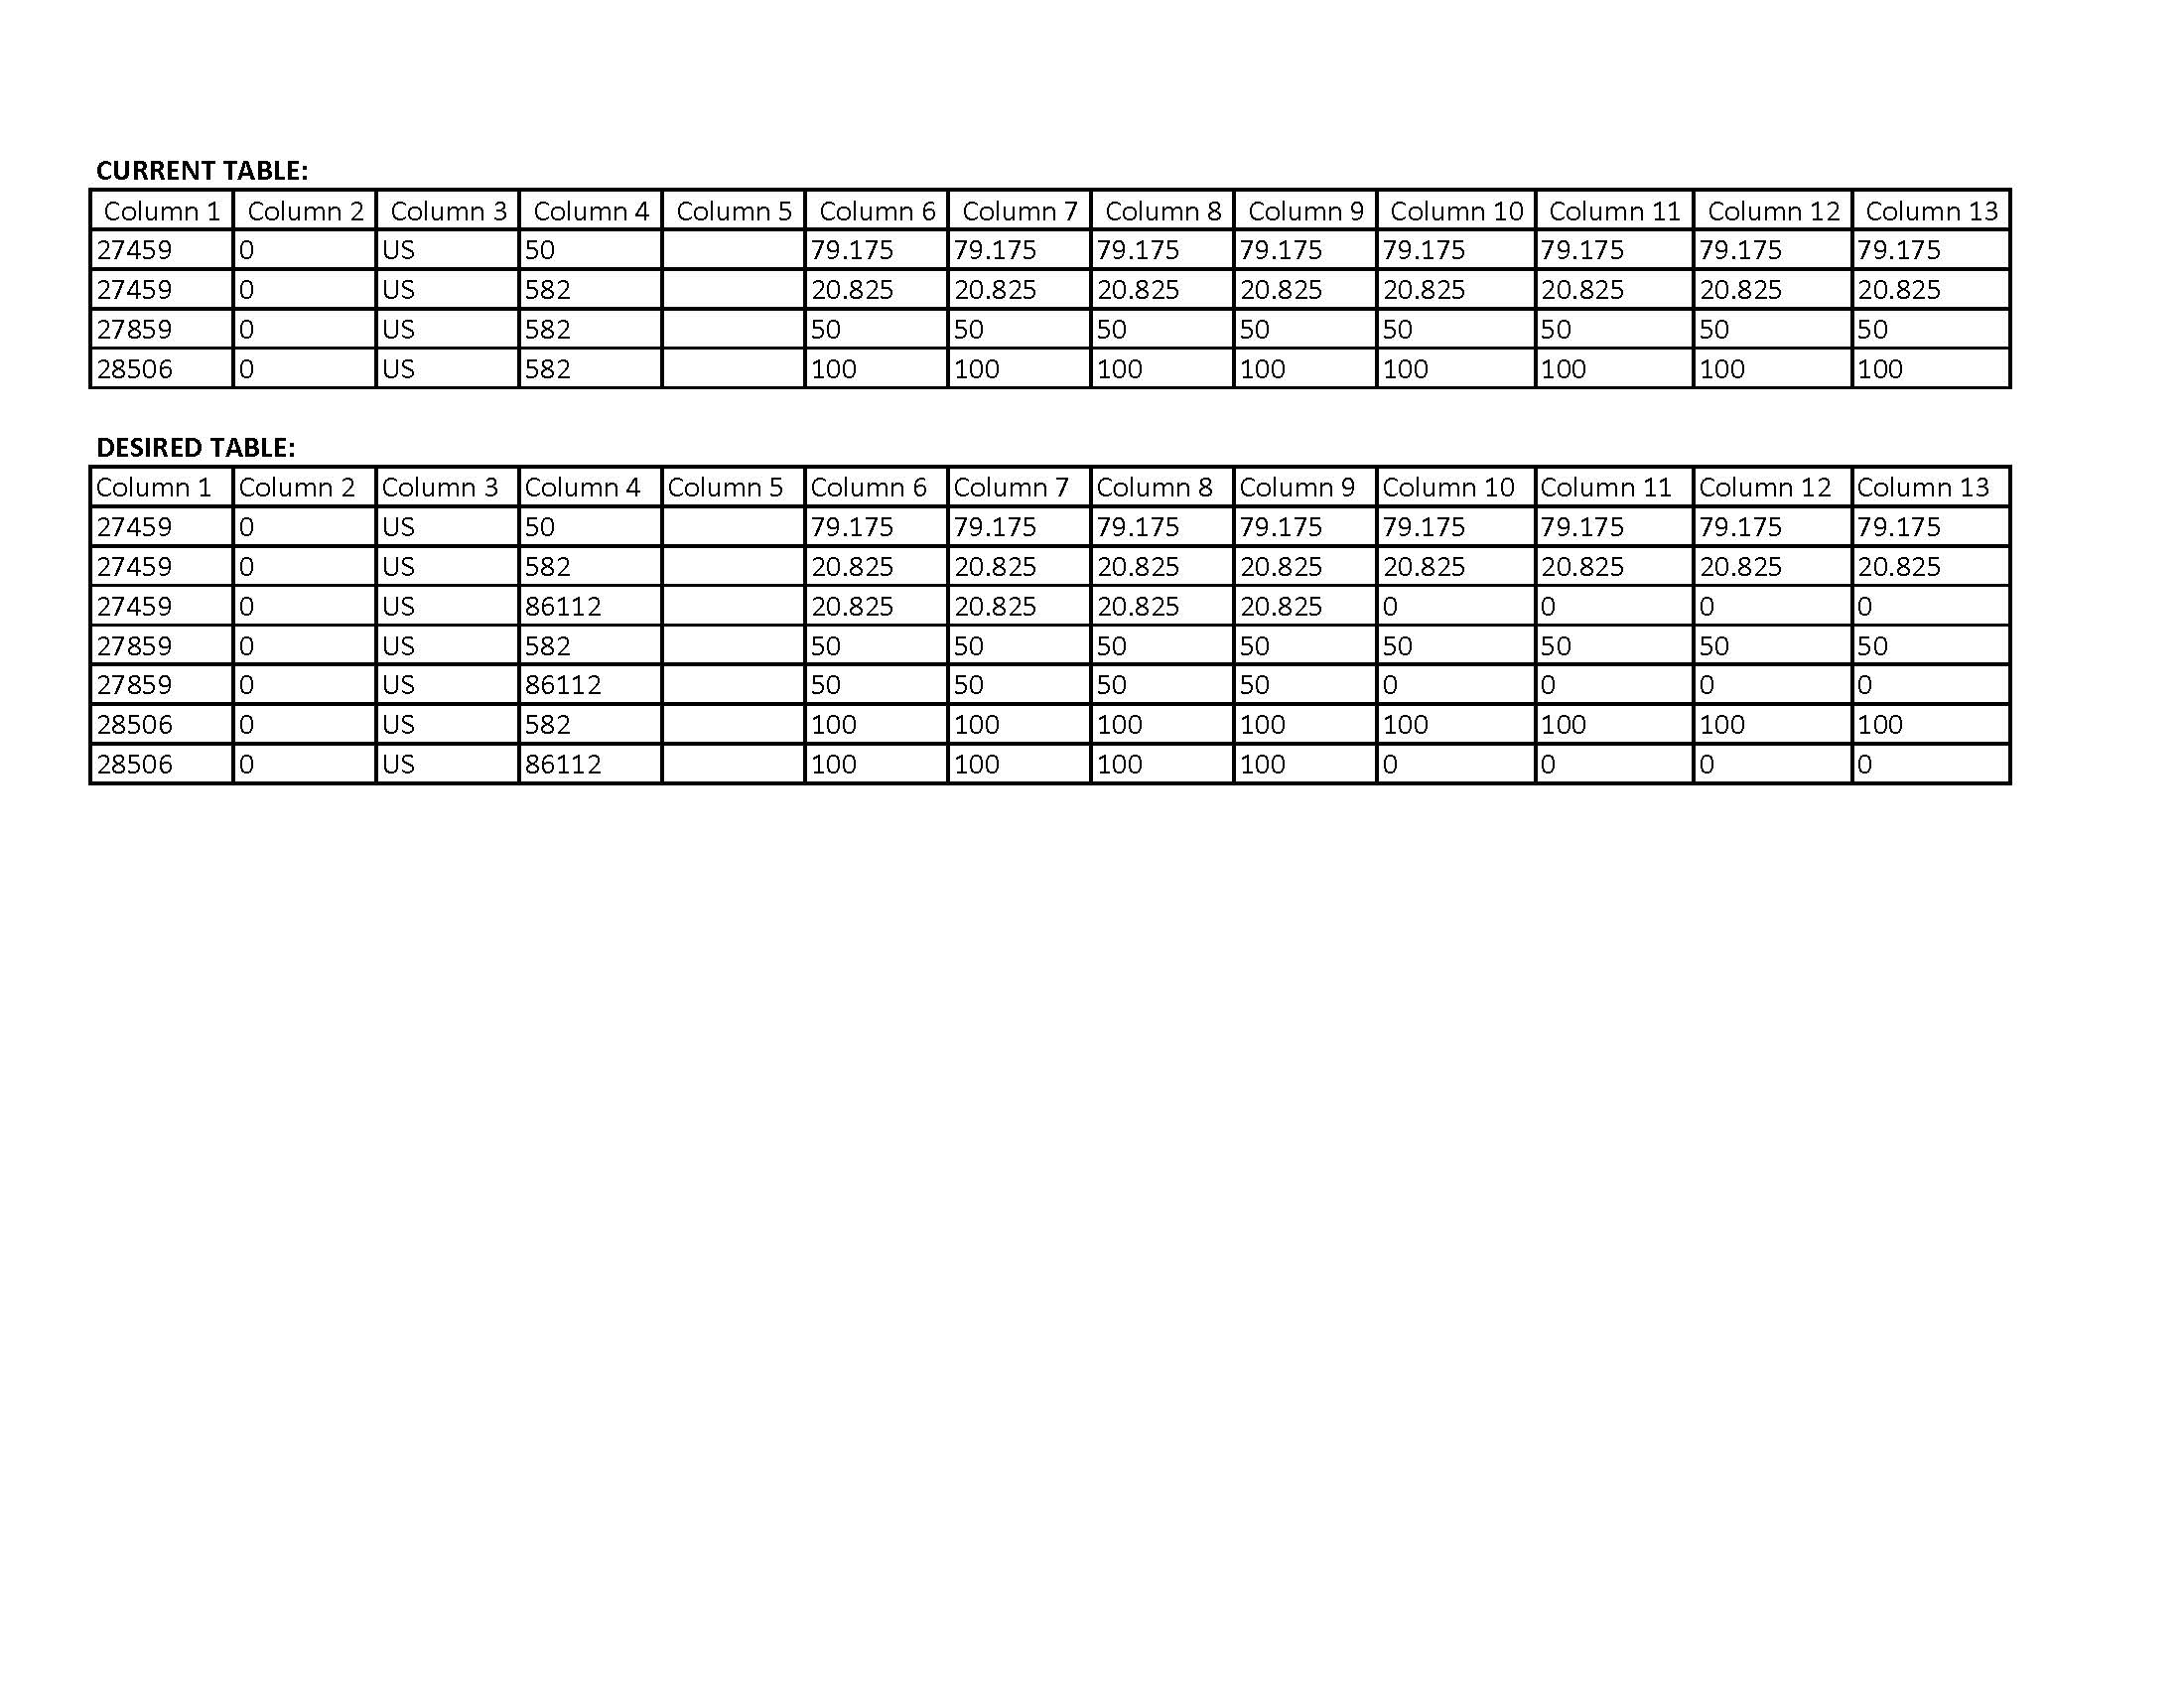 Excel Vba Insert Row Based On Cell Value